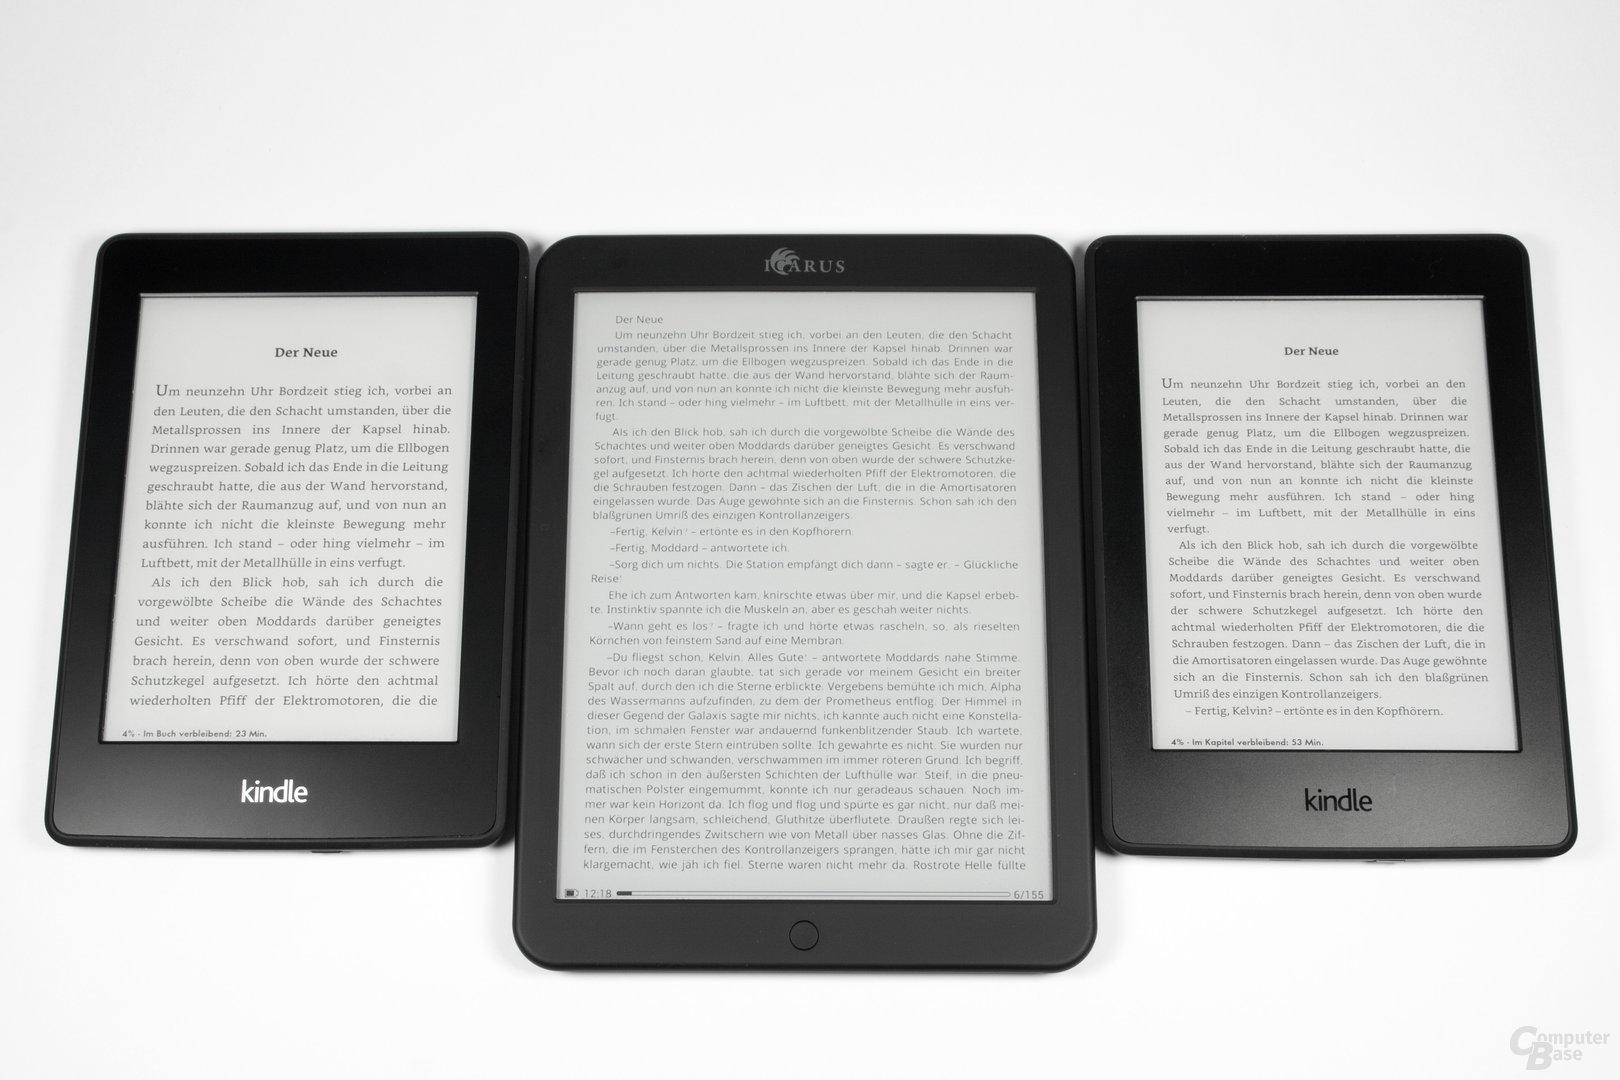 Schriftbildvergleich Kindle Paperwhite 2013 vs. Icarus Illumina XL vs. Kindle Papherwhite 2014